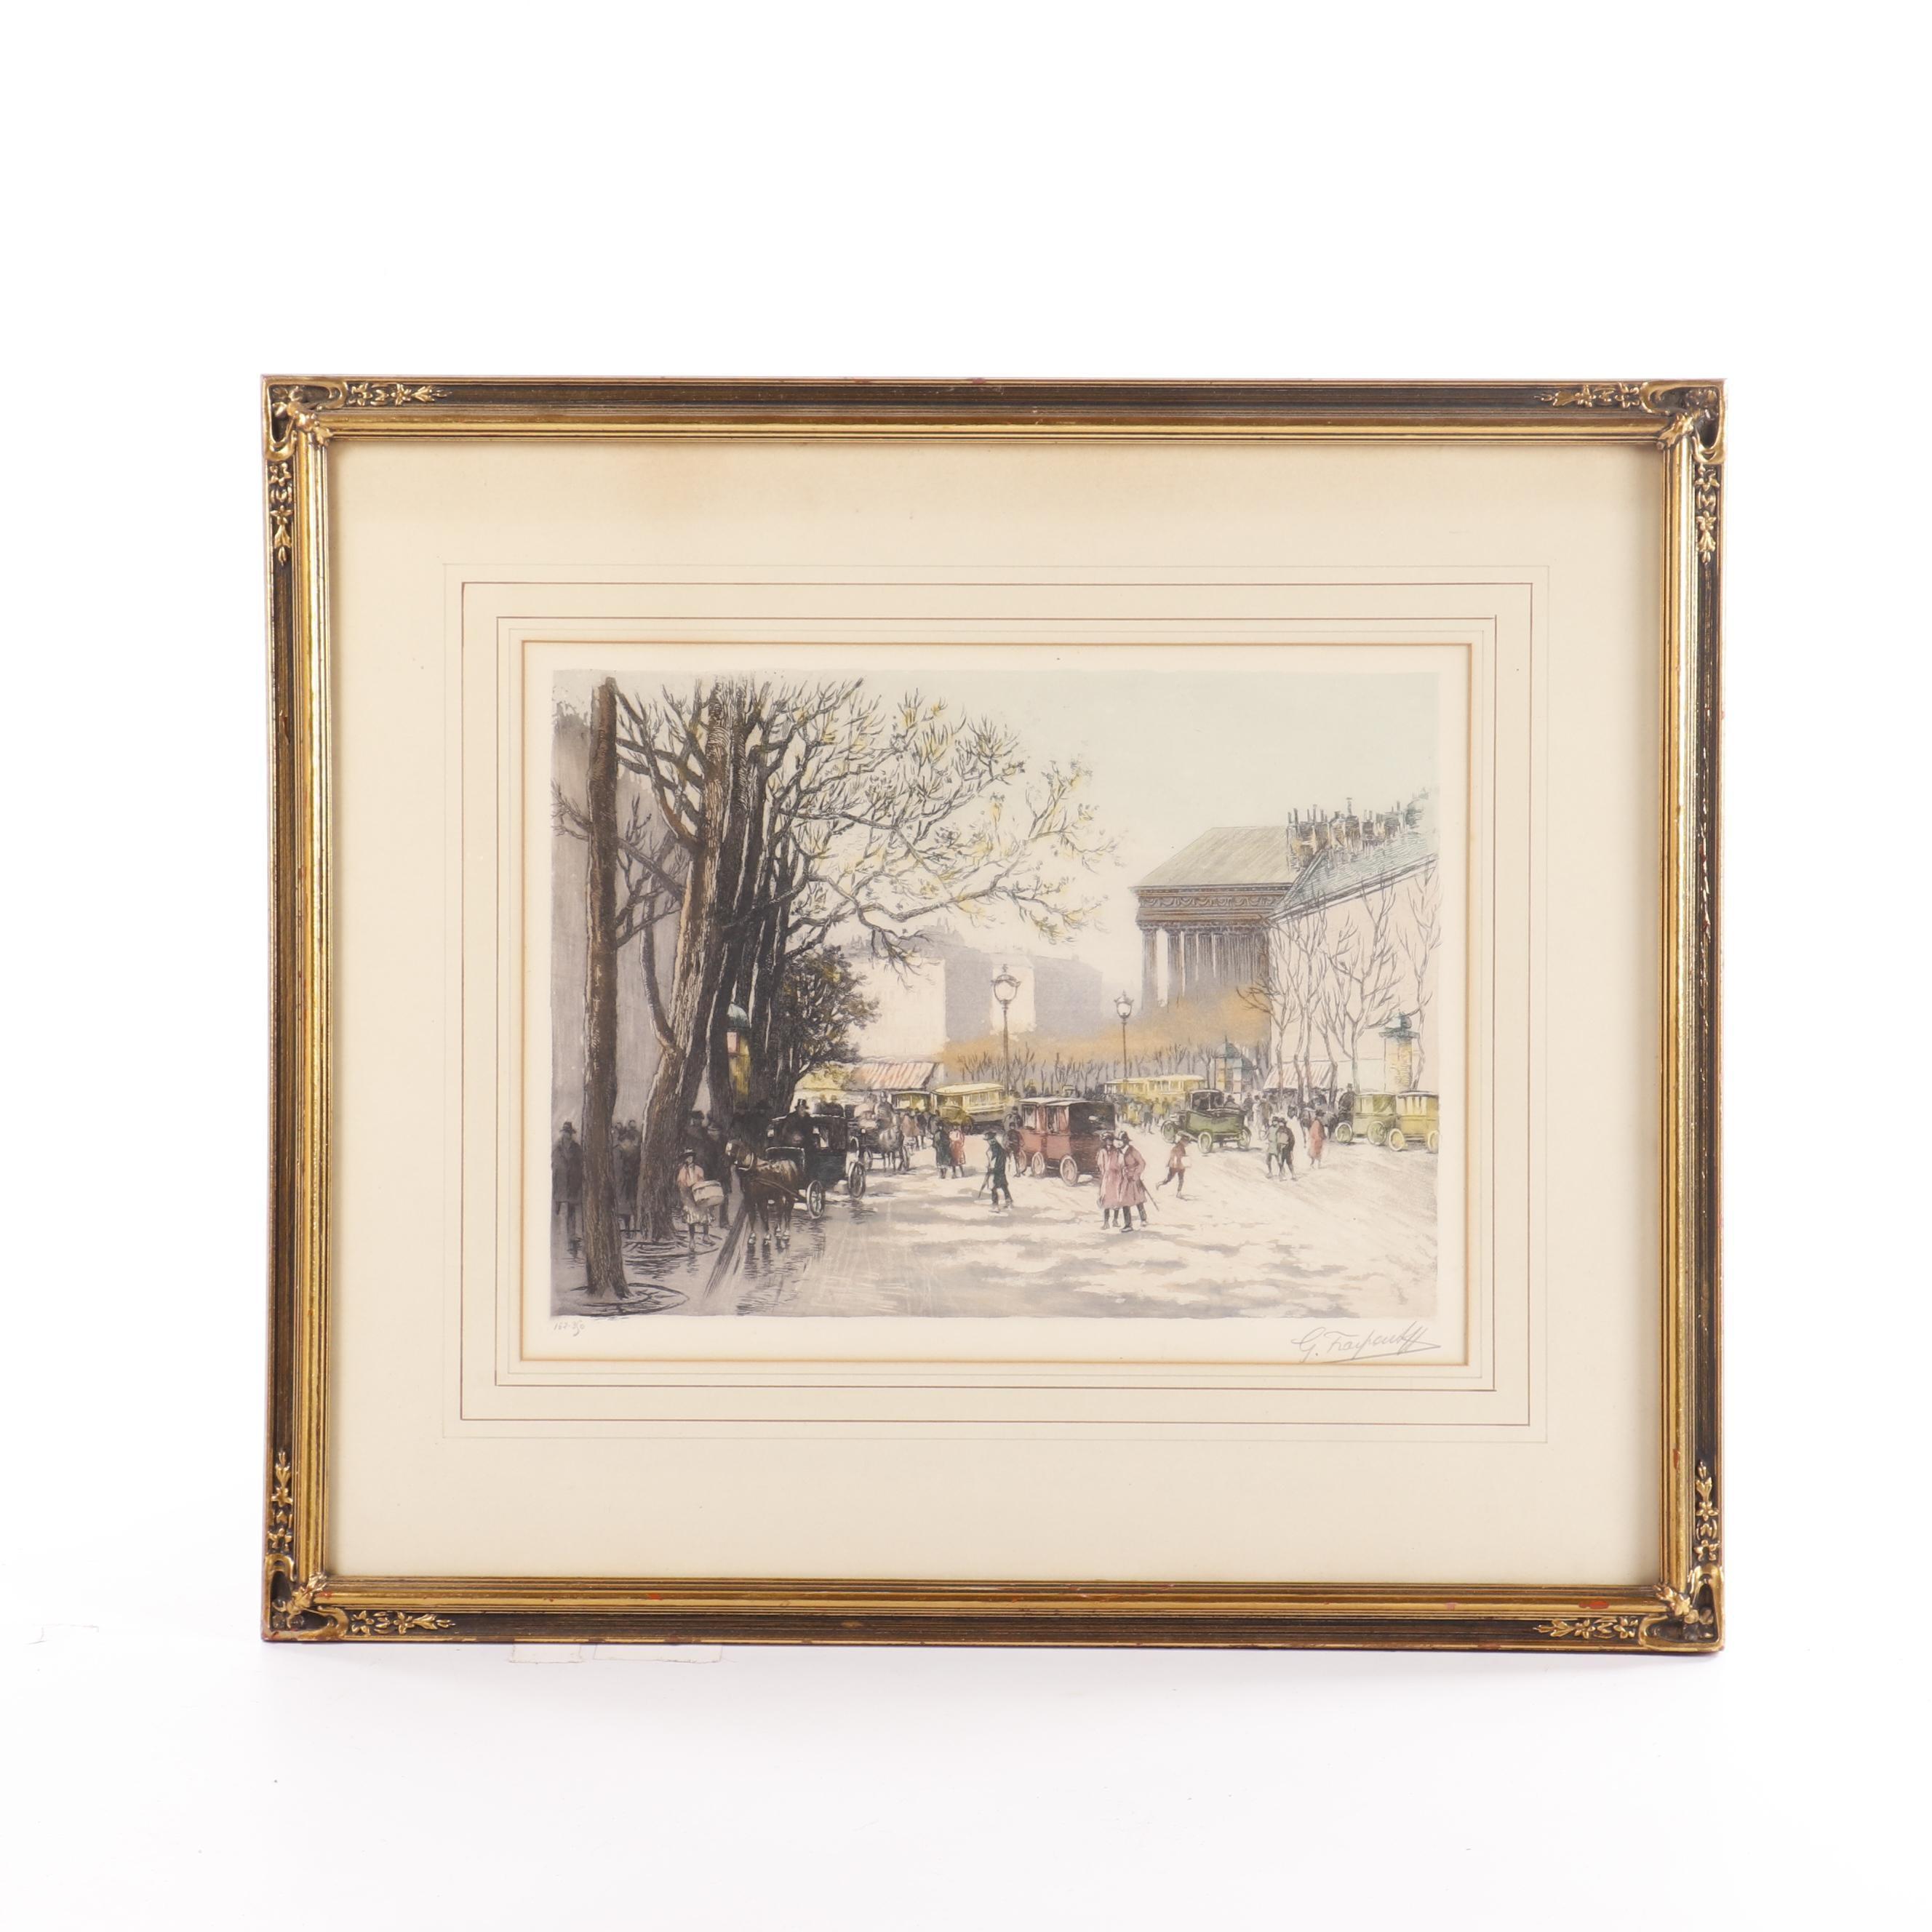 Gustage Fraipont Lithograph of European Street Scene